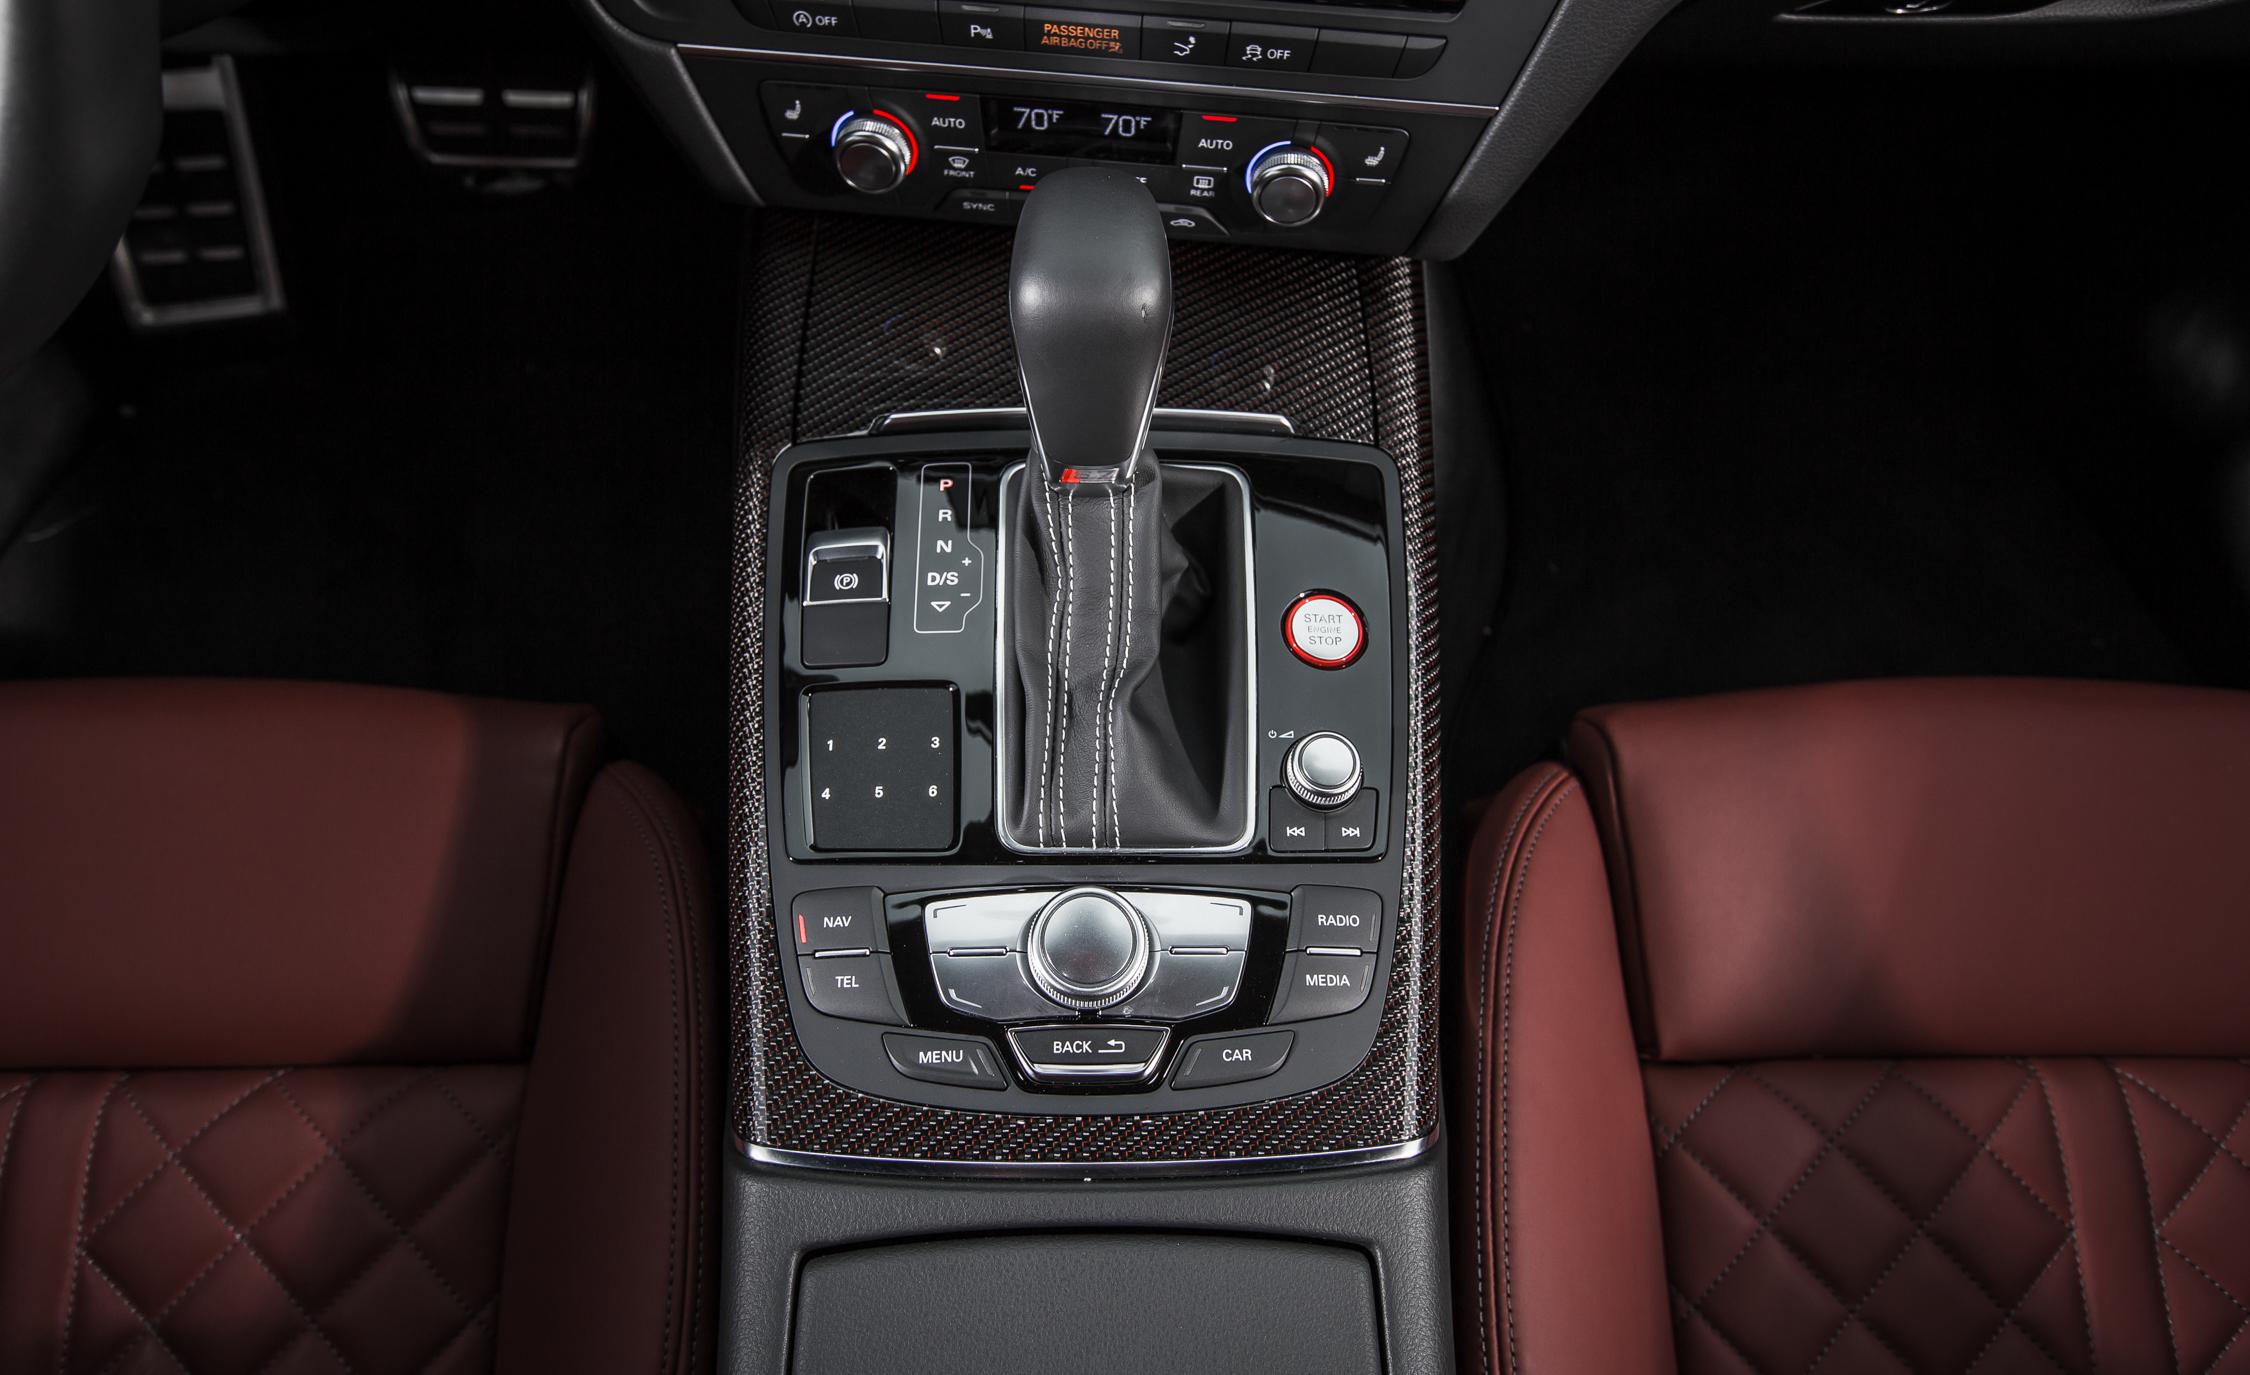 2016 Audi S7 Sedan Gear Shift Knob